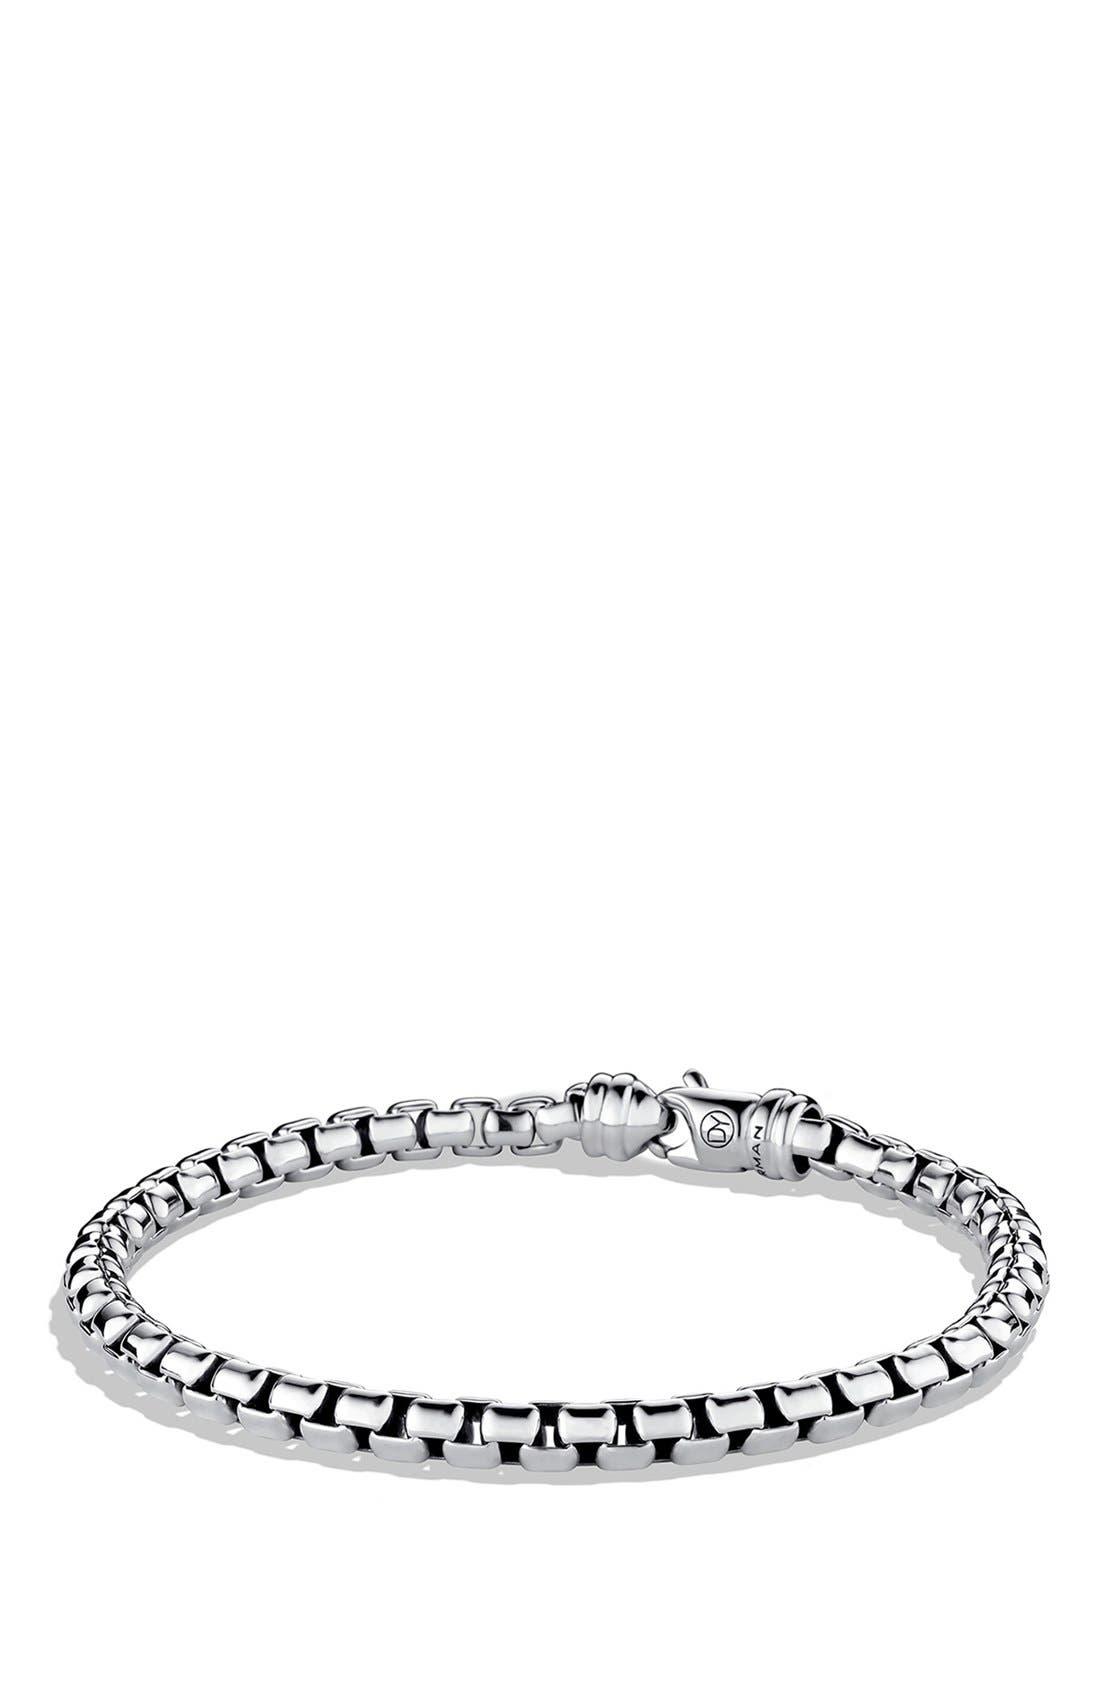 DAVID YURMAN 'Chain' Large Link Box Chain Bracelet, Main, color, SILVER